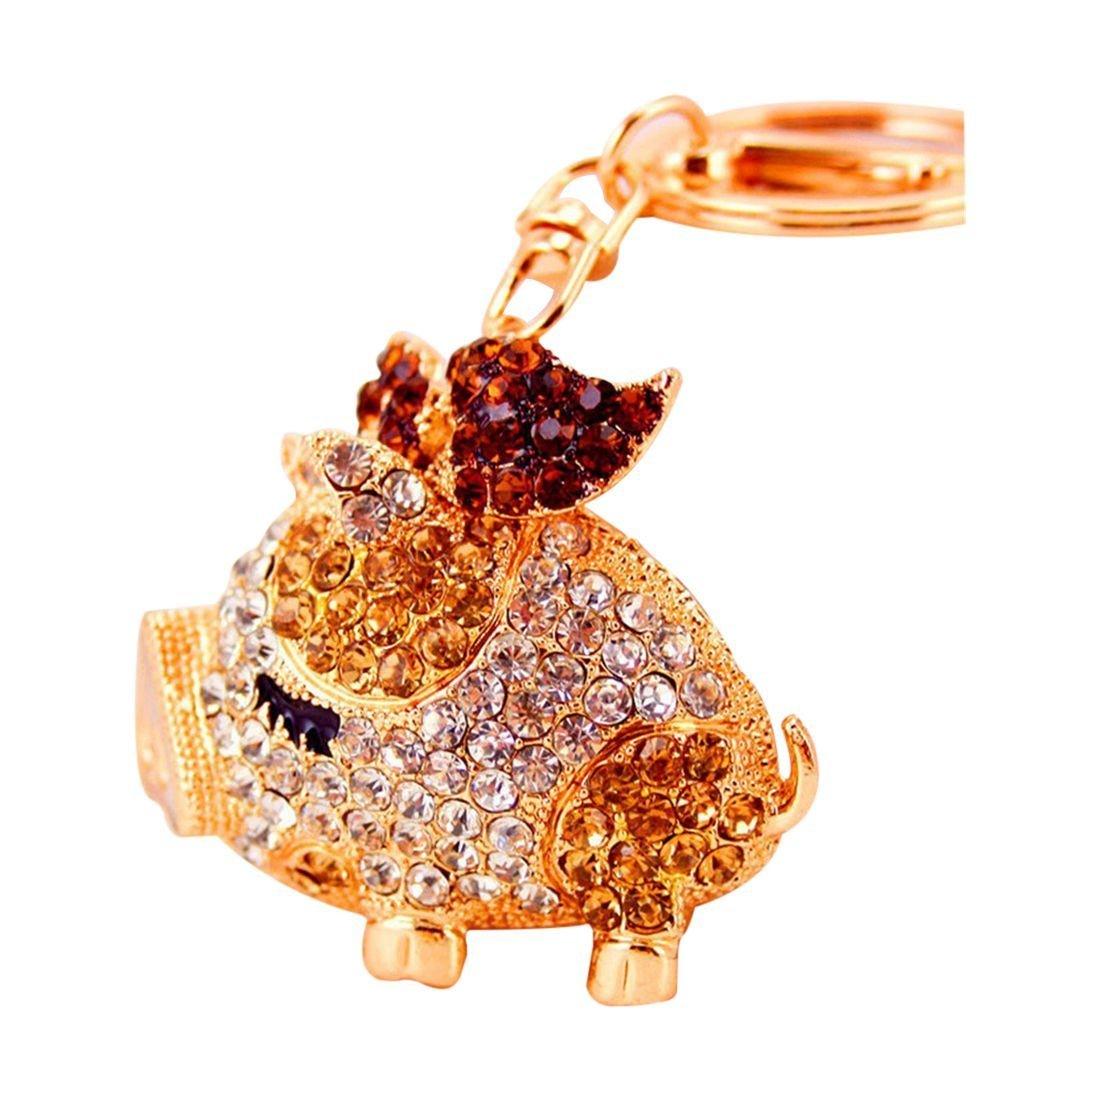 SODIAL(R) Fashion Novelty Gifts Trinket Rhinestone Cute Bow Pig Keychain, Women Bag Pendant Keyring (champagne)